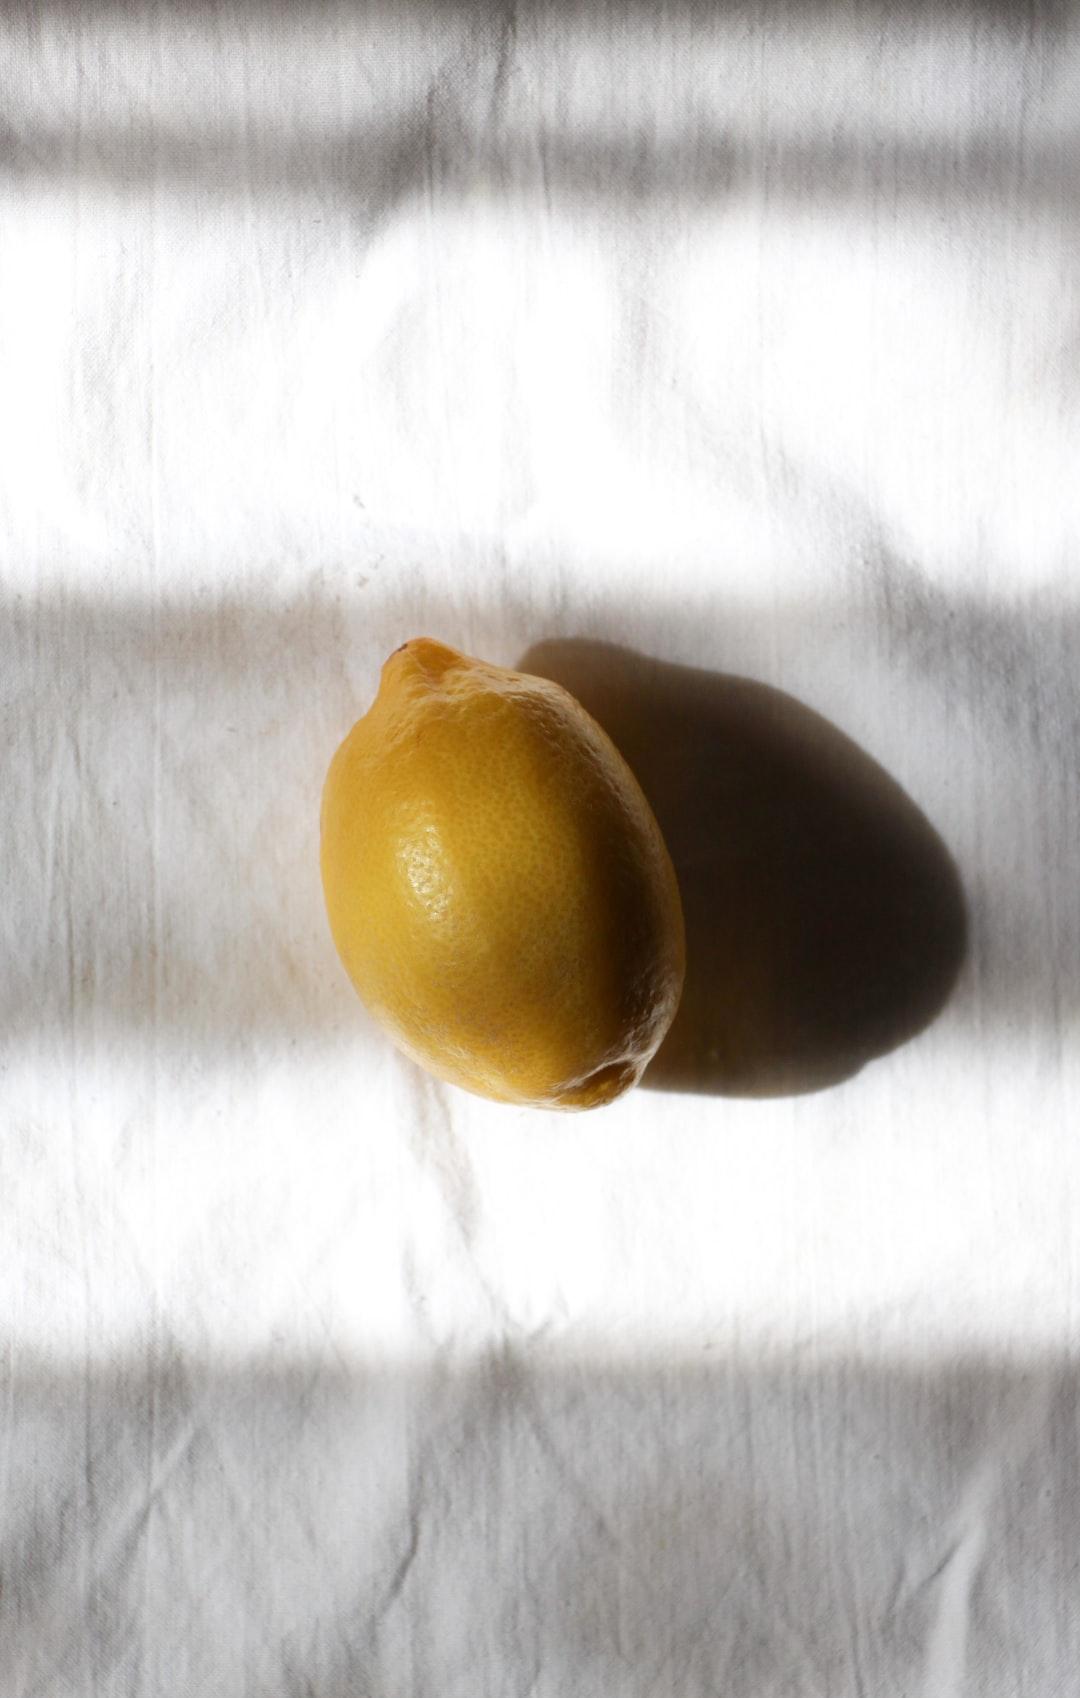 Word weaver sink : Derek and stiles lemon fanfiction